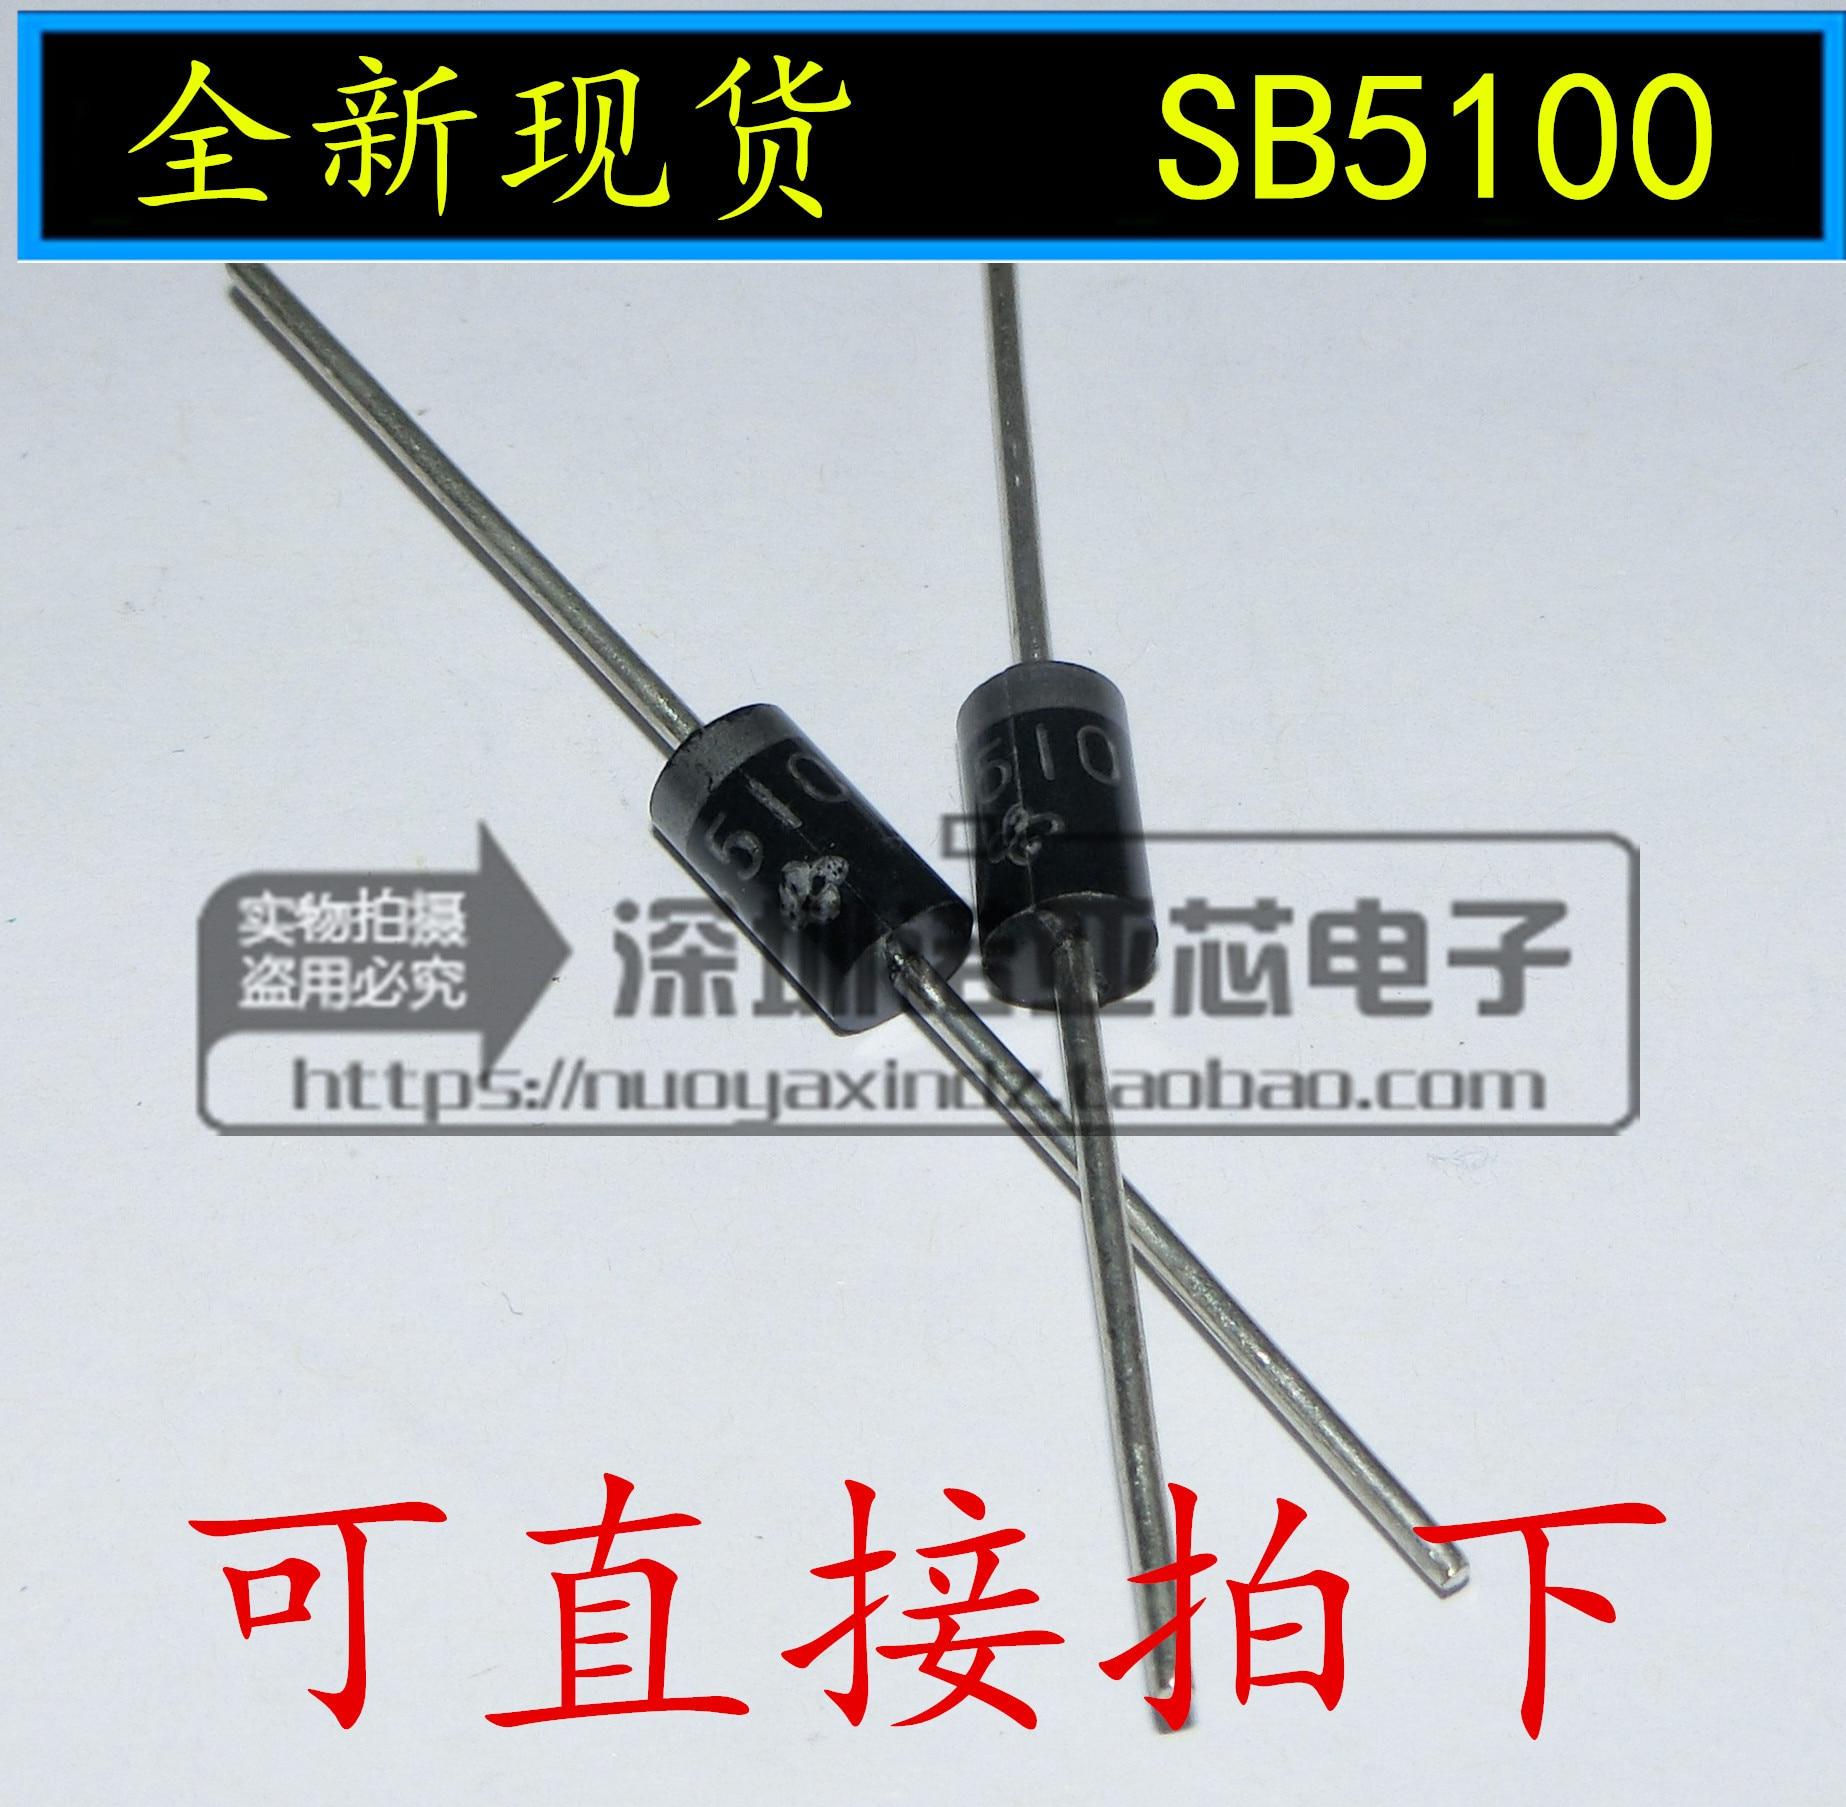 10 шт./лот SR5100 SB5100 5A 100V DO-27 в наличии